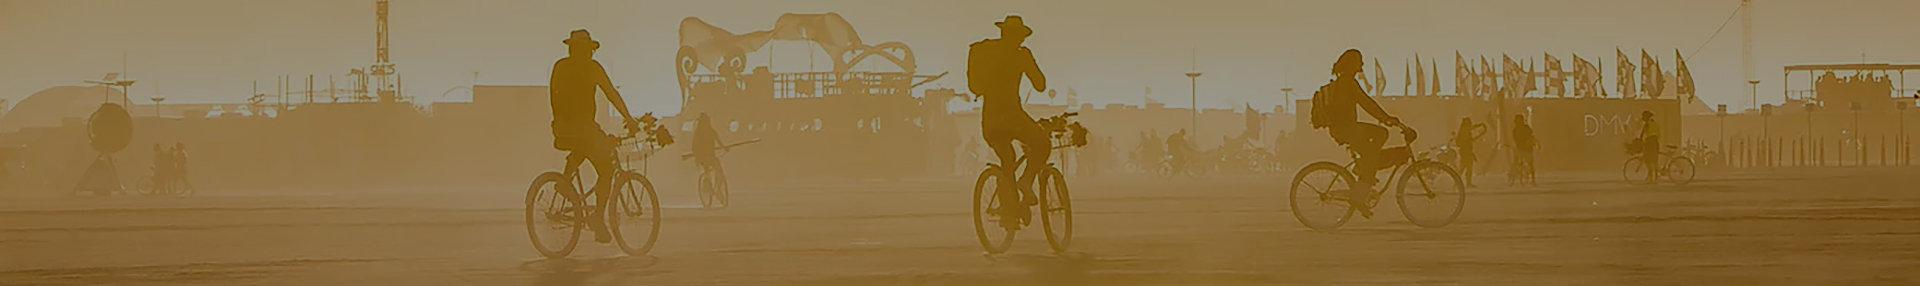 bm-bike-rentals-header.jpg